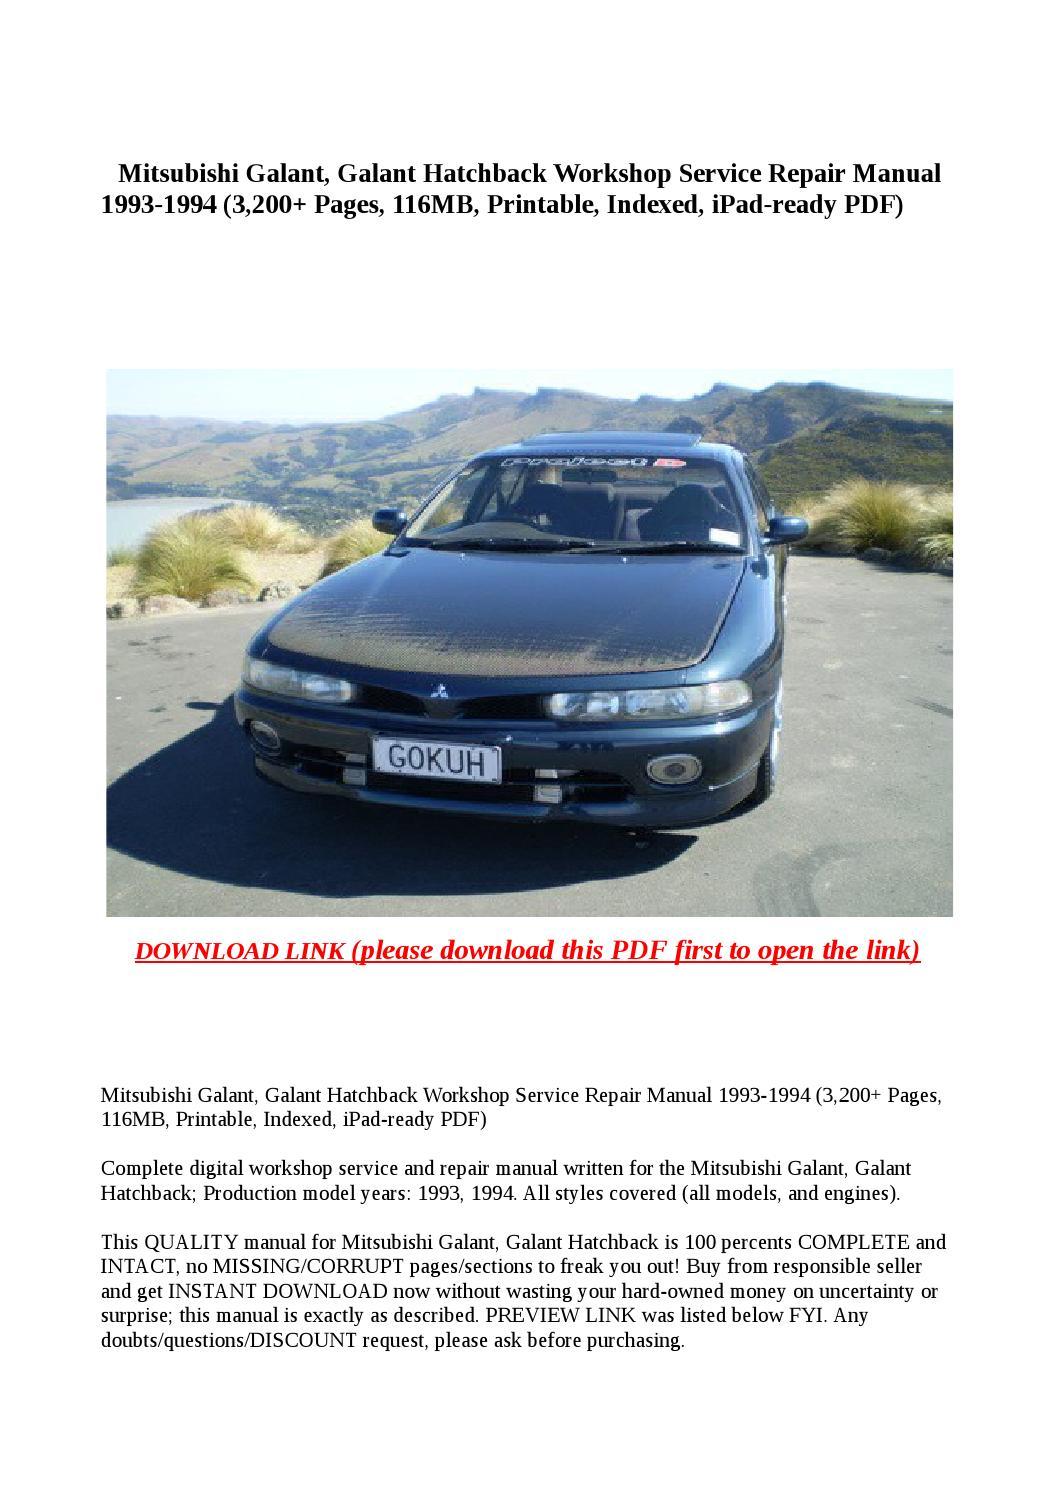 Mitsubishi galant, galant hatchback workshop service repair manual 1993  1994 (3,200 pages, 116mb, pr by buhbu - issuu